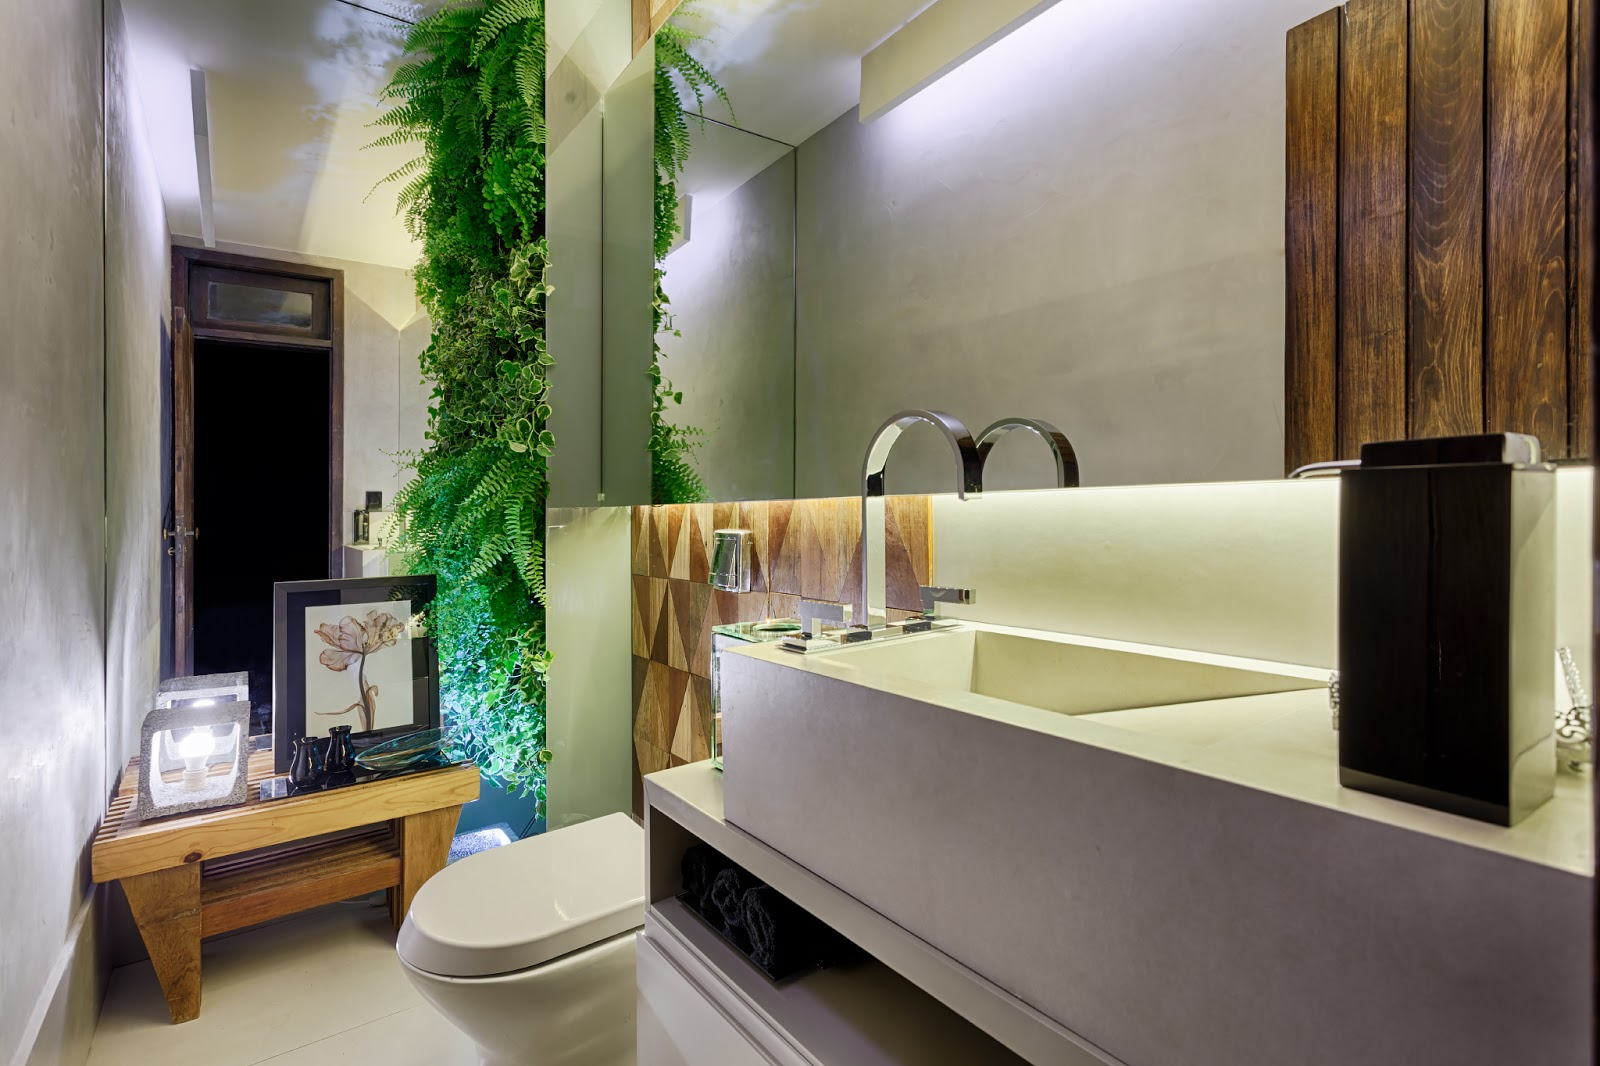 Banheiro Publico Masculino Flávia Bizzotto #386827 1600 1066